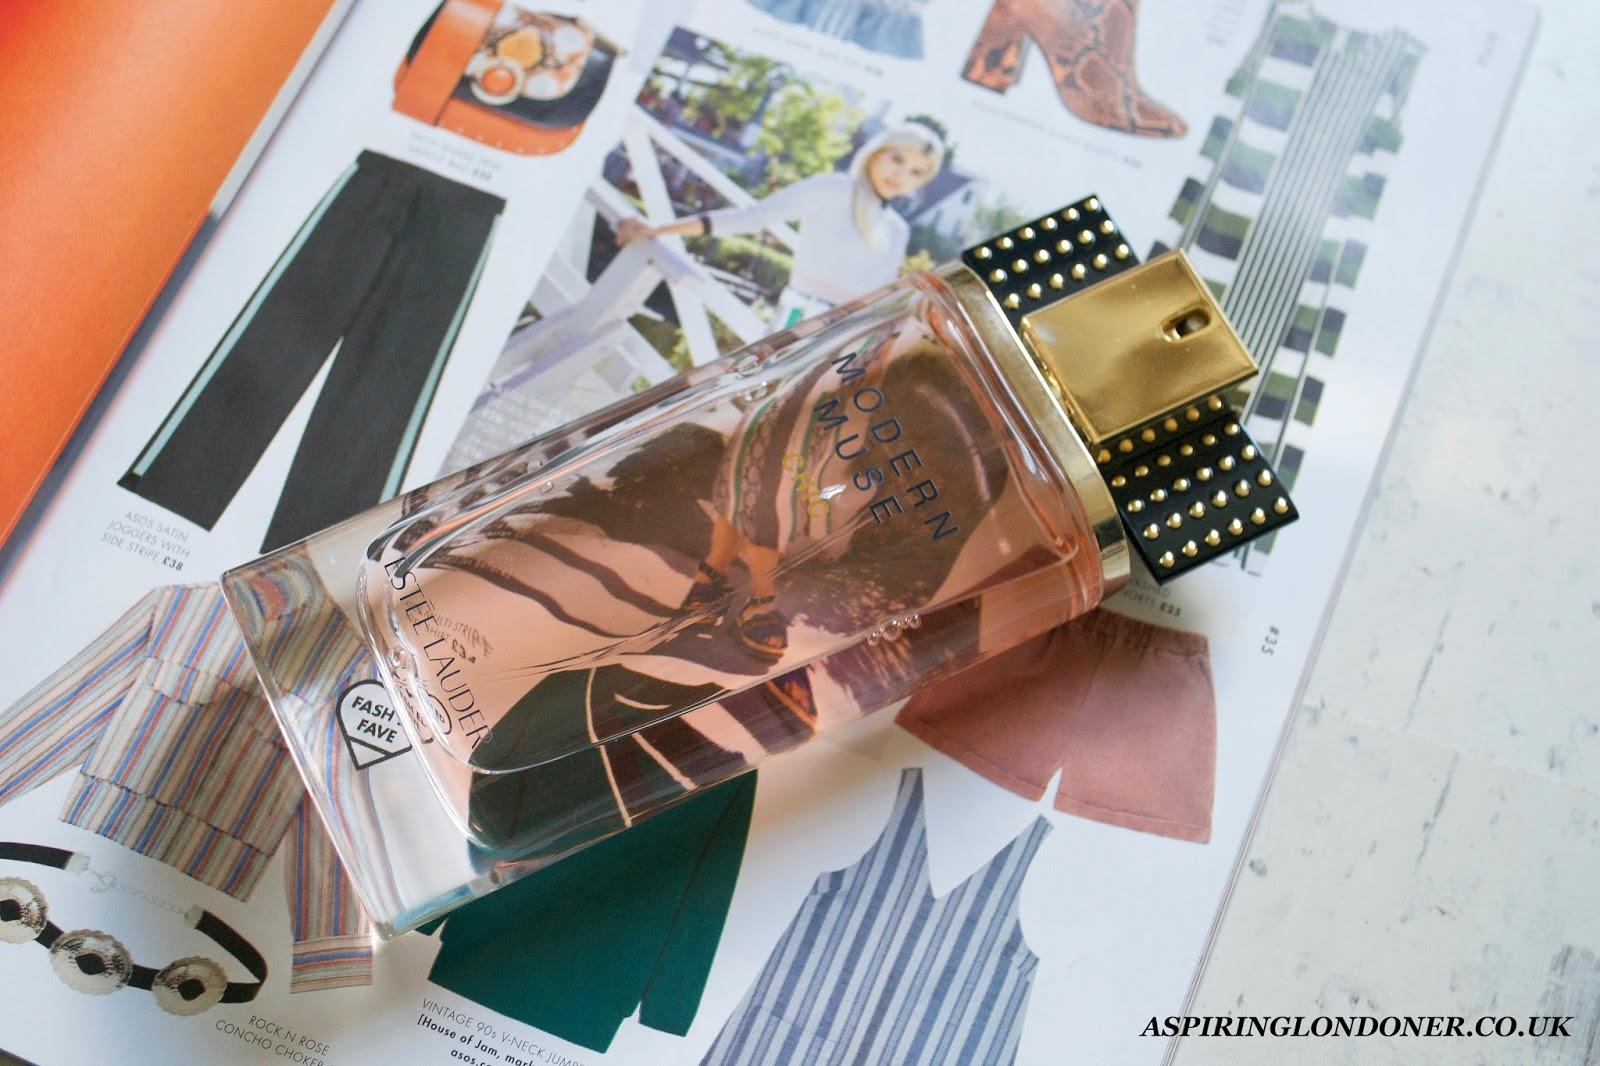 stee Lauder Modern Muse Chic Perfume - Aspiring Londoner